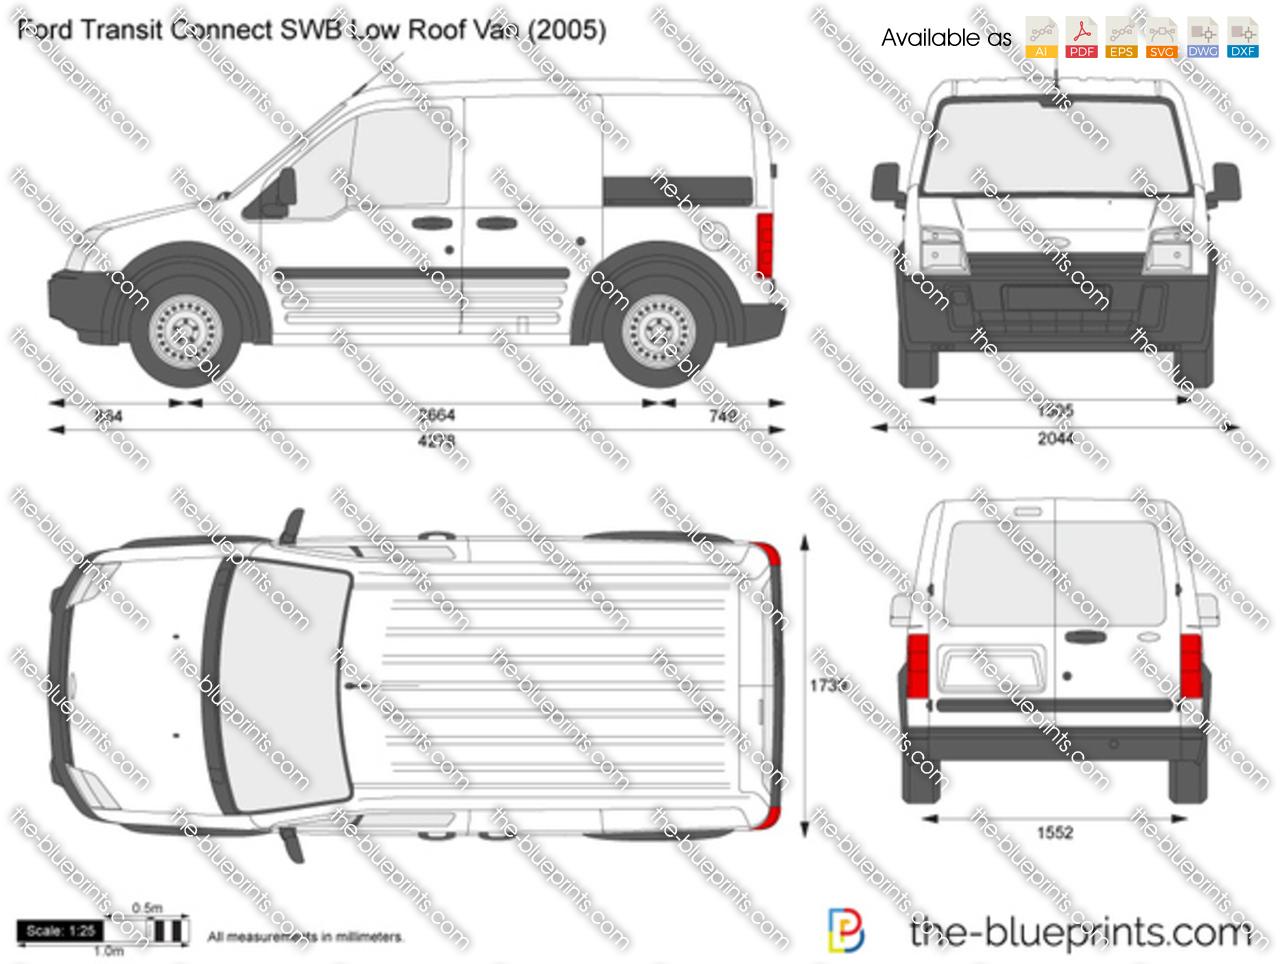 Грузопассажирское авто: марки, характеристики